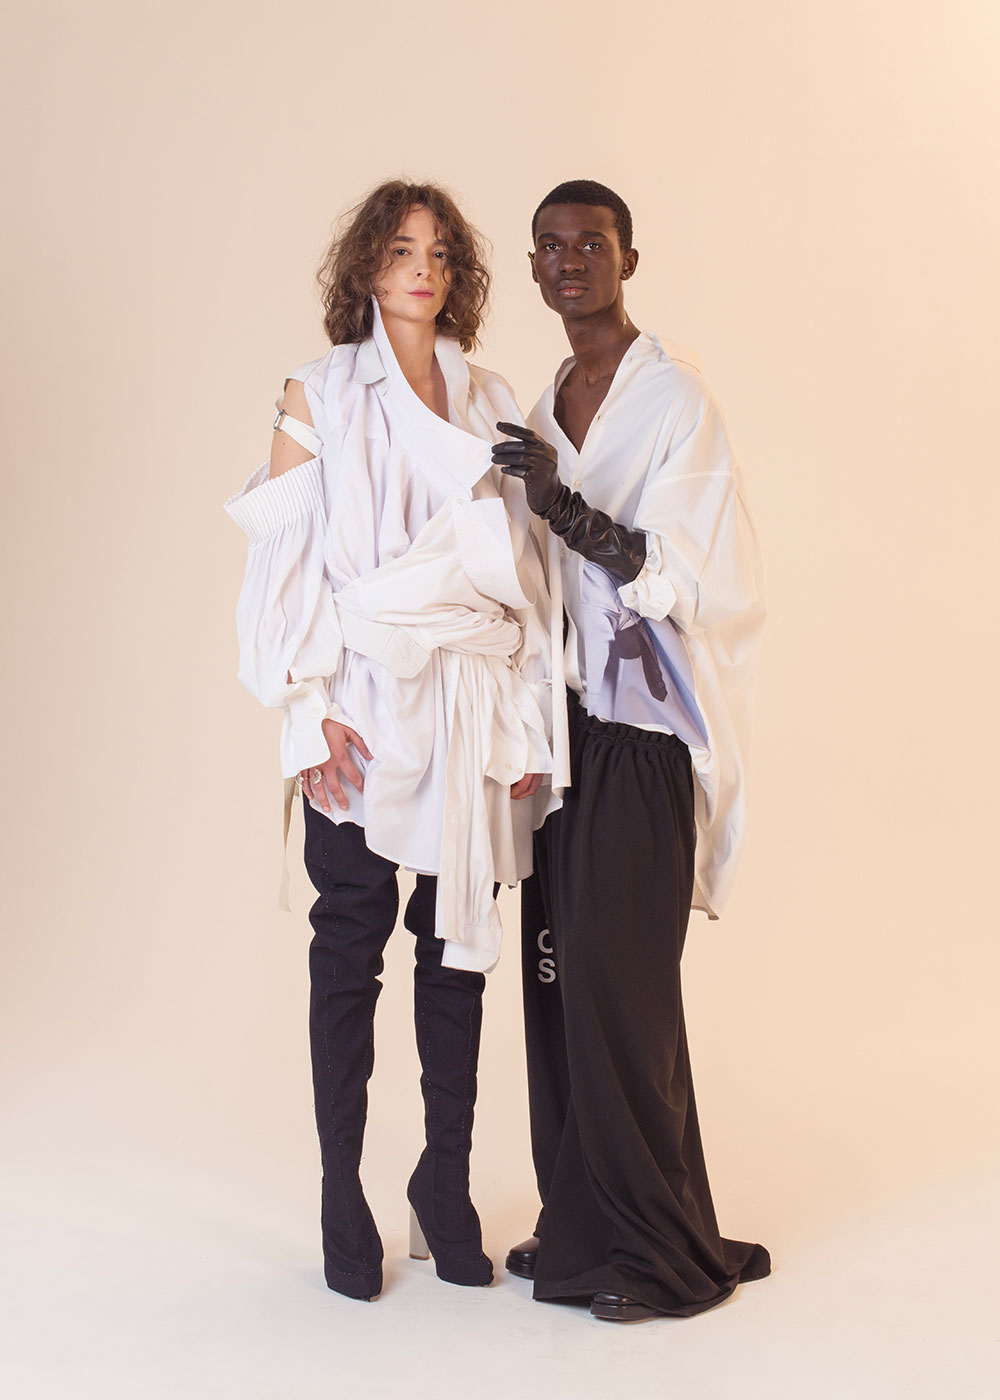 Gabrielle : Multi-White shirt Alexandre Paty, Ring Persta Jason Harderwijk: Shirt Raf Simons, Pants Hood by Air, Gloves Georges Morand